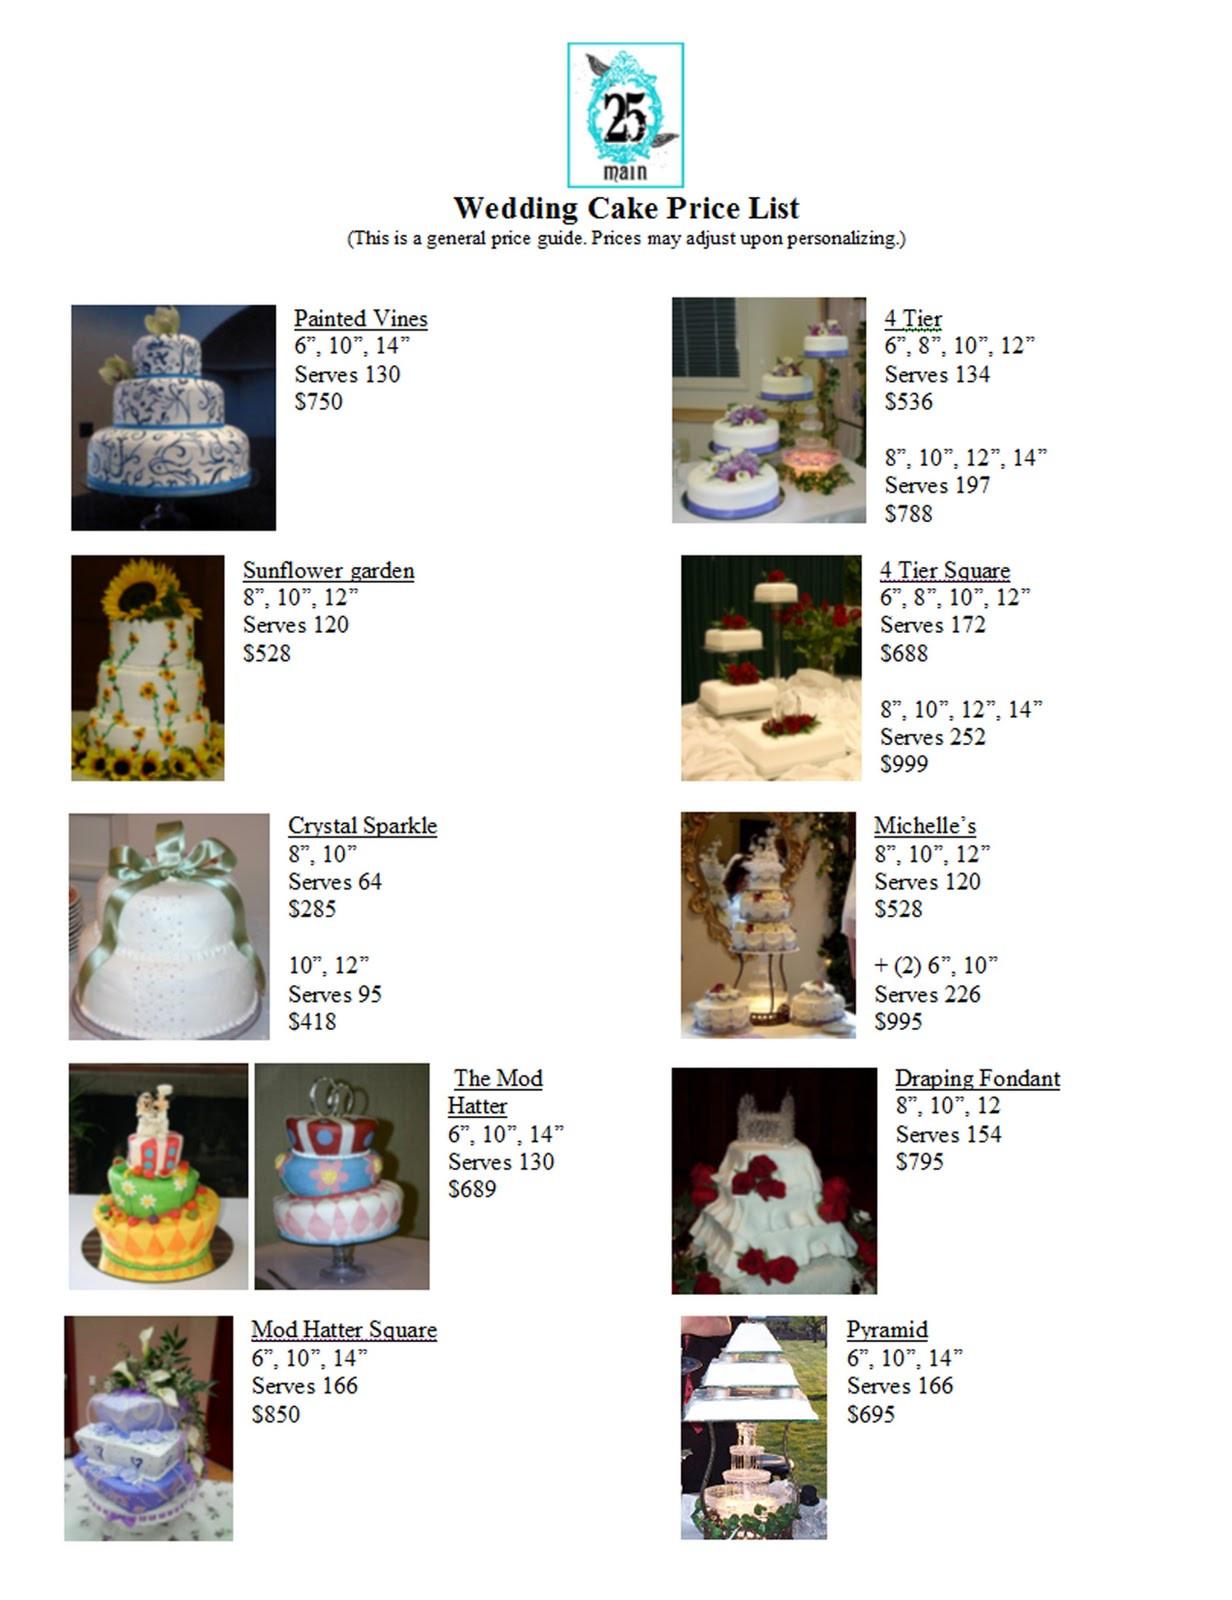 Walmart Wedding Cakes Price List  Vauna s Cakes Wedding Cake Price List